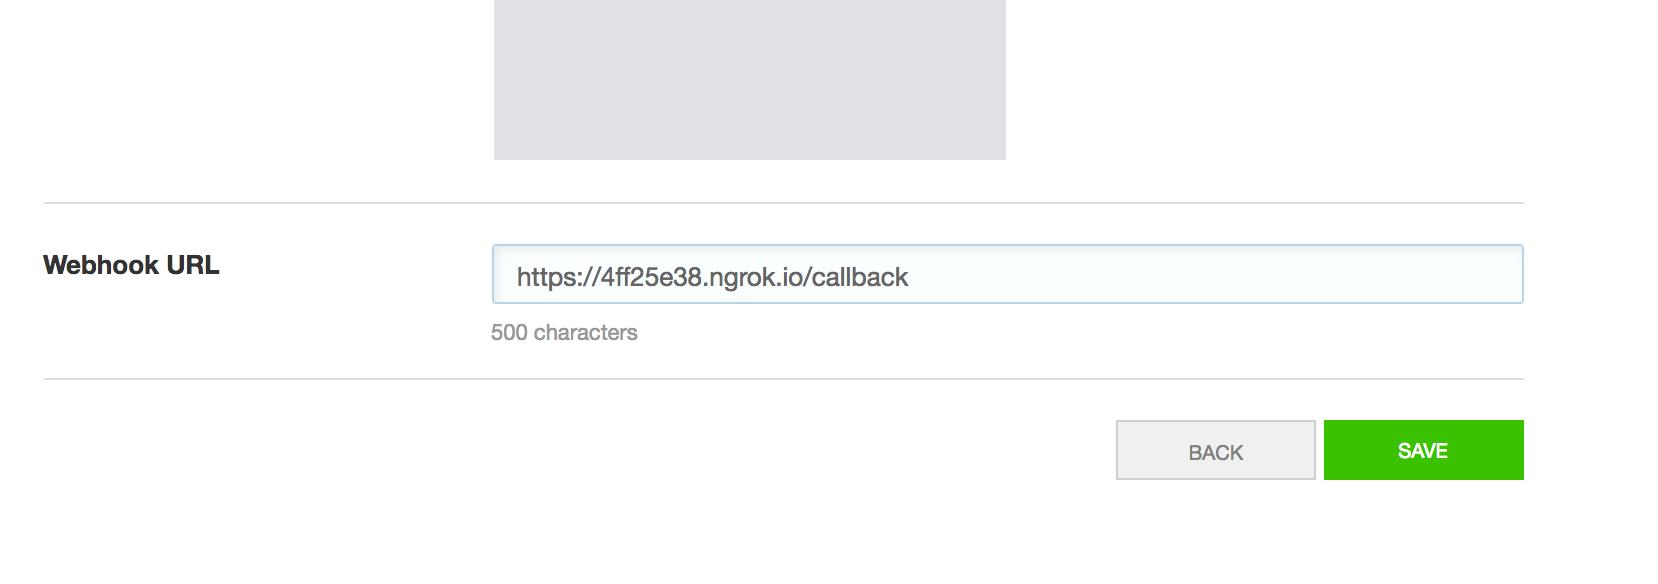 webhook_callback.png